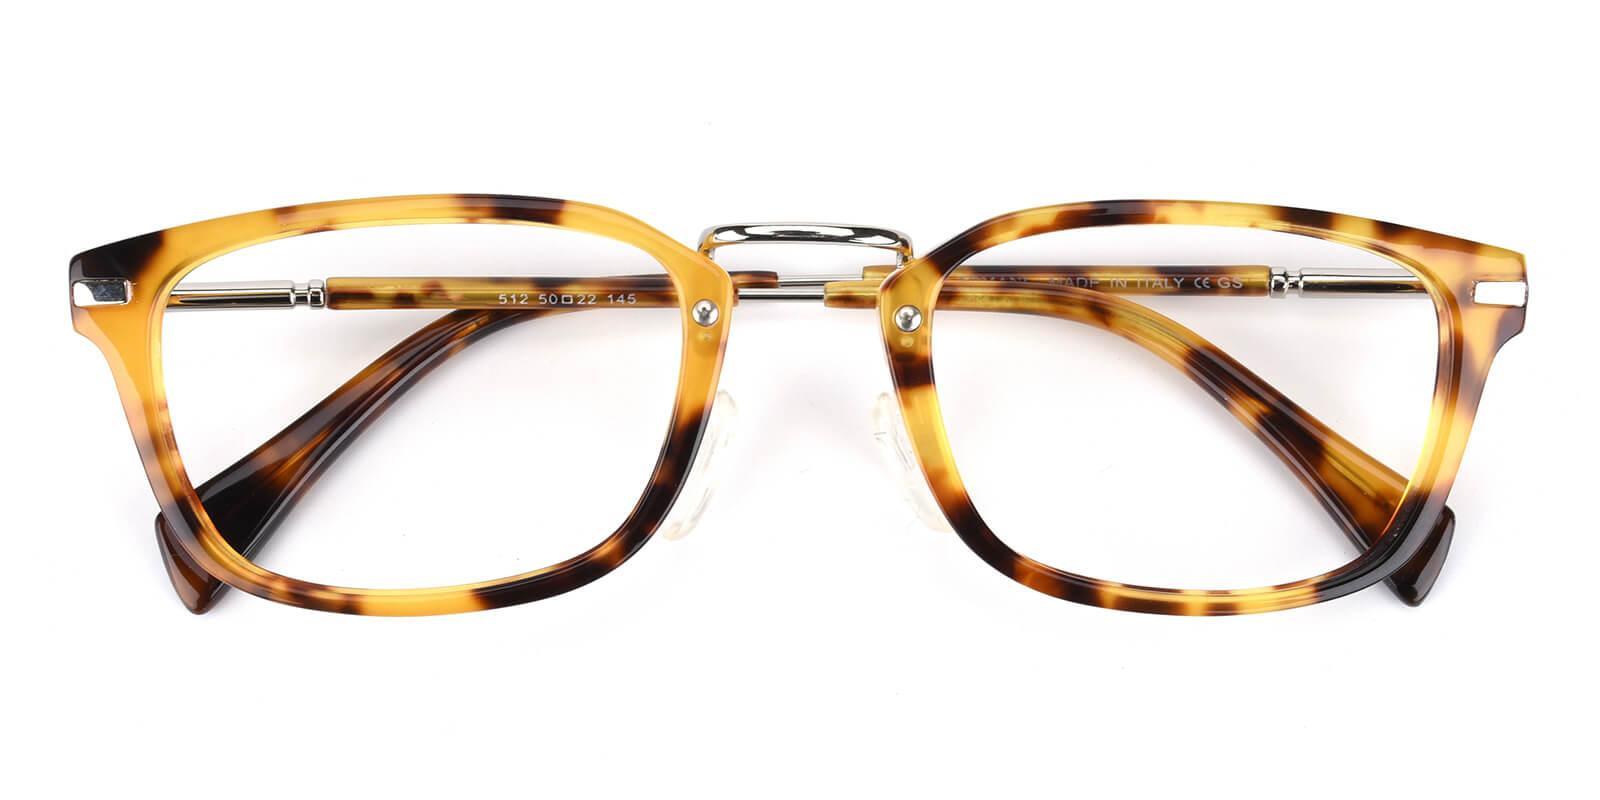 Madatte-Tortoise-Rectangle-Acetate / Metal-Eyeglasses-detail